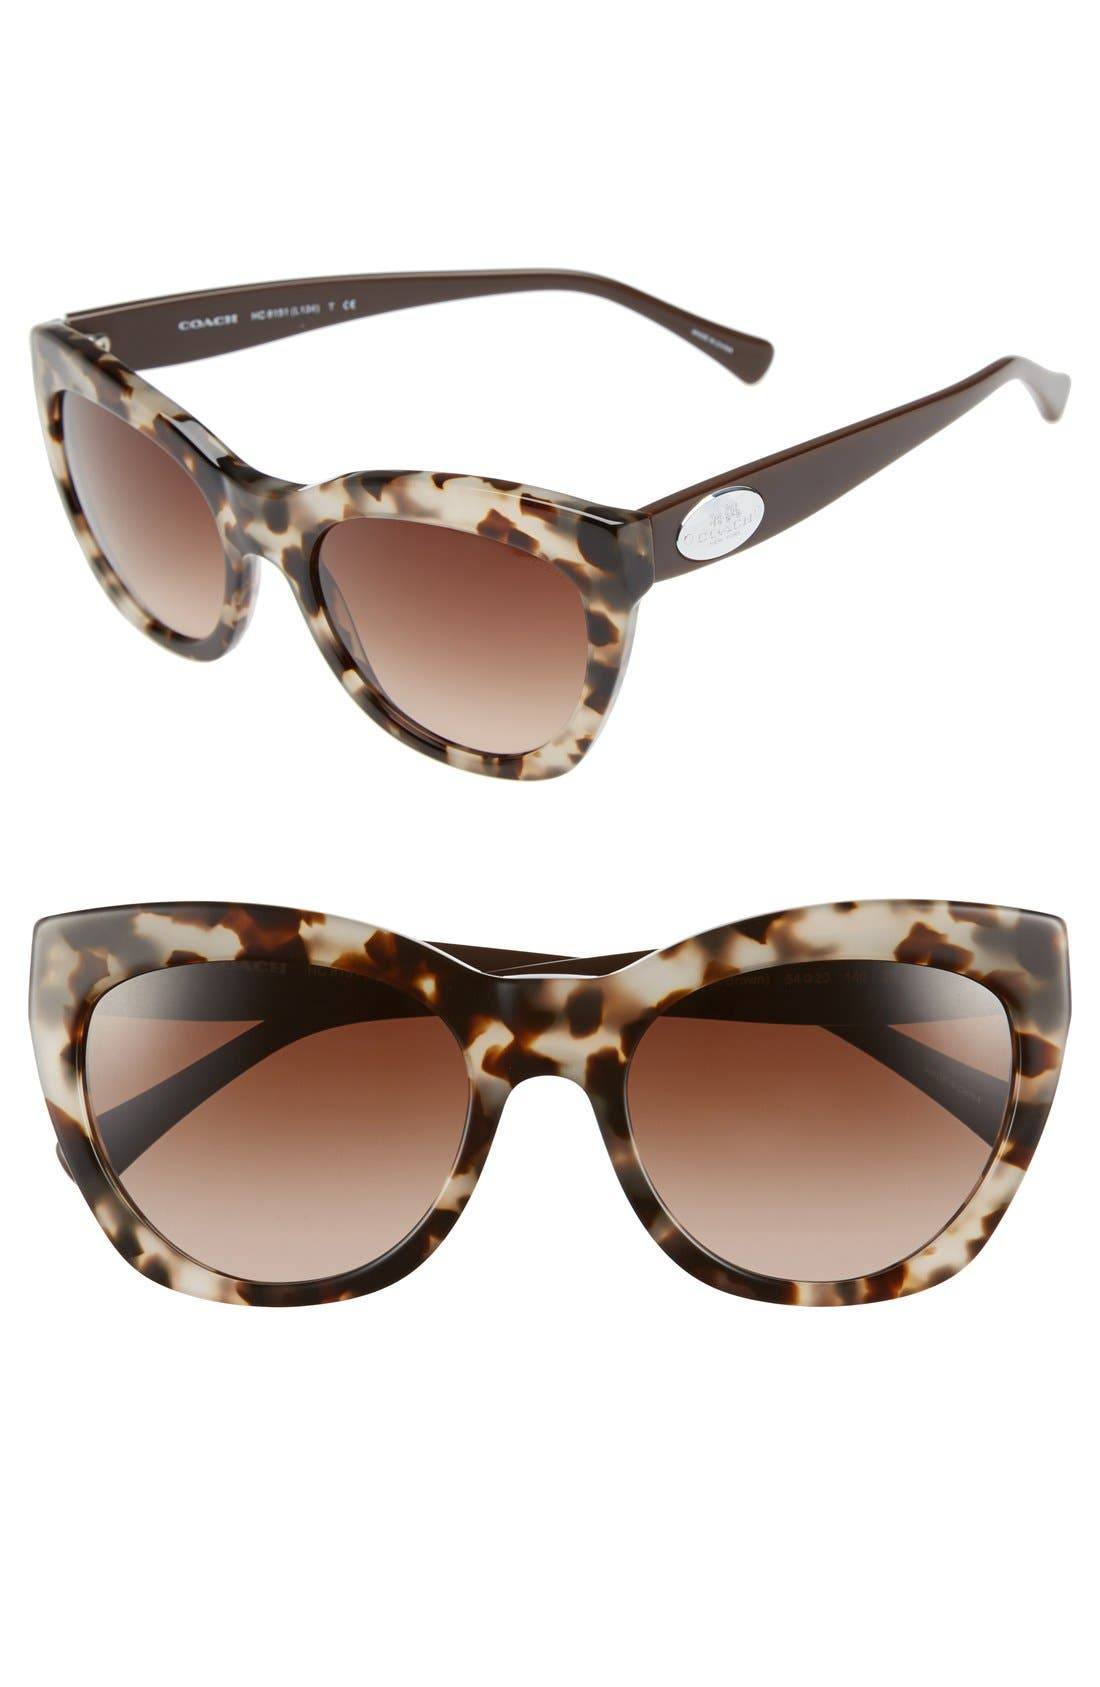 Alternate Image 1 Selected - COACH 54mm Retro Sunglasses